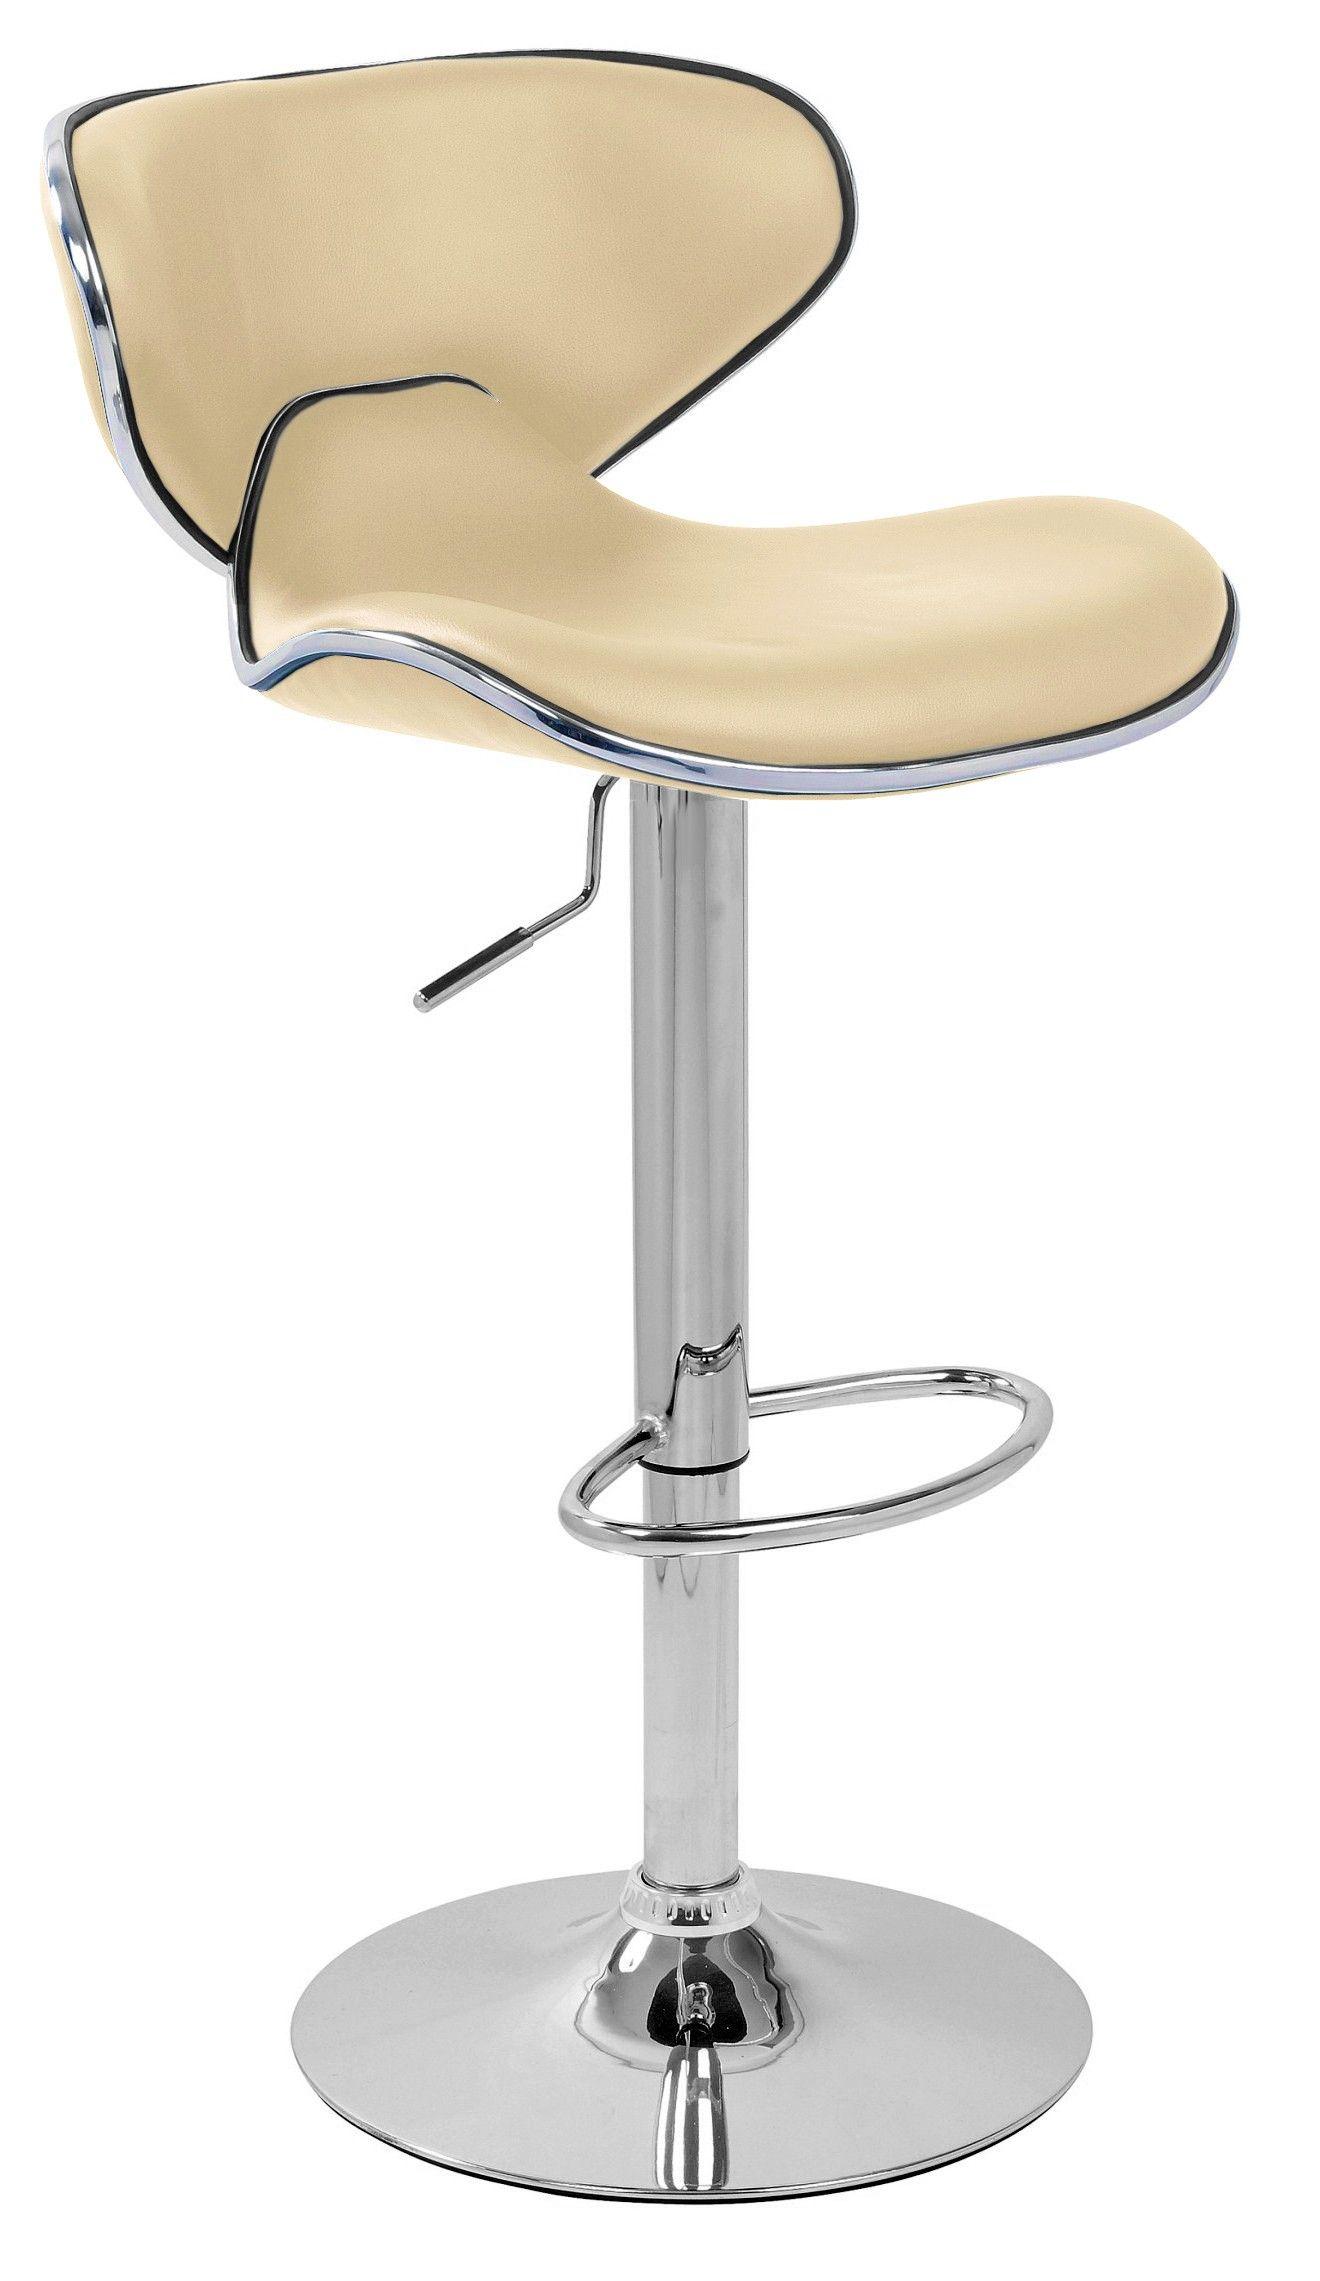 Neutral Color Of Modern Bar Stool Design With Adjustable Height And Round Stainless Steel Base Also Back Support And Cream Lea Barhocker Leder Barhocker Hocker